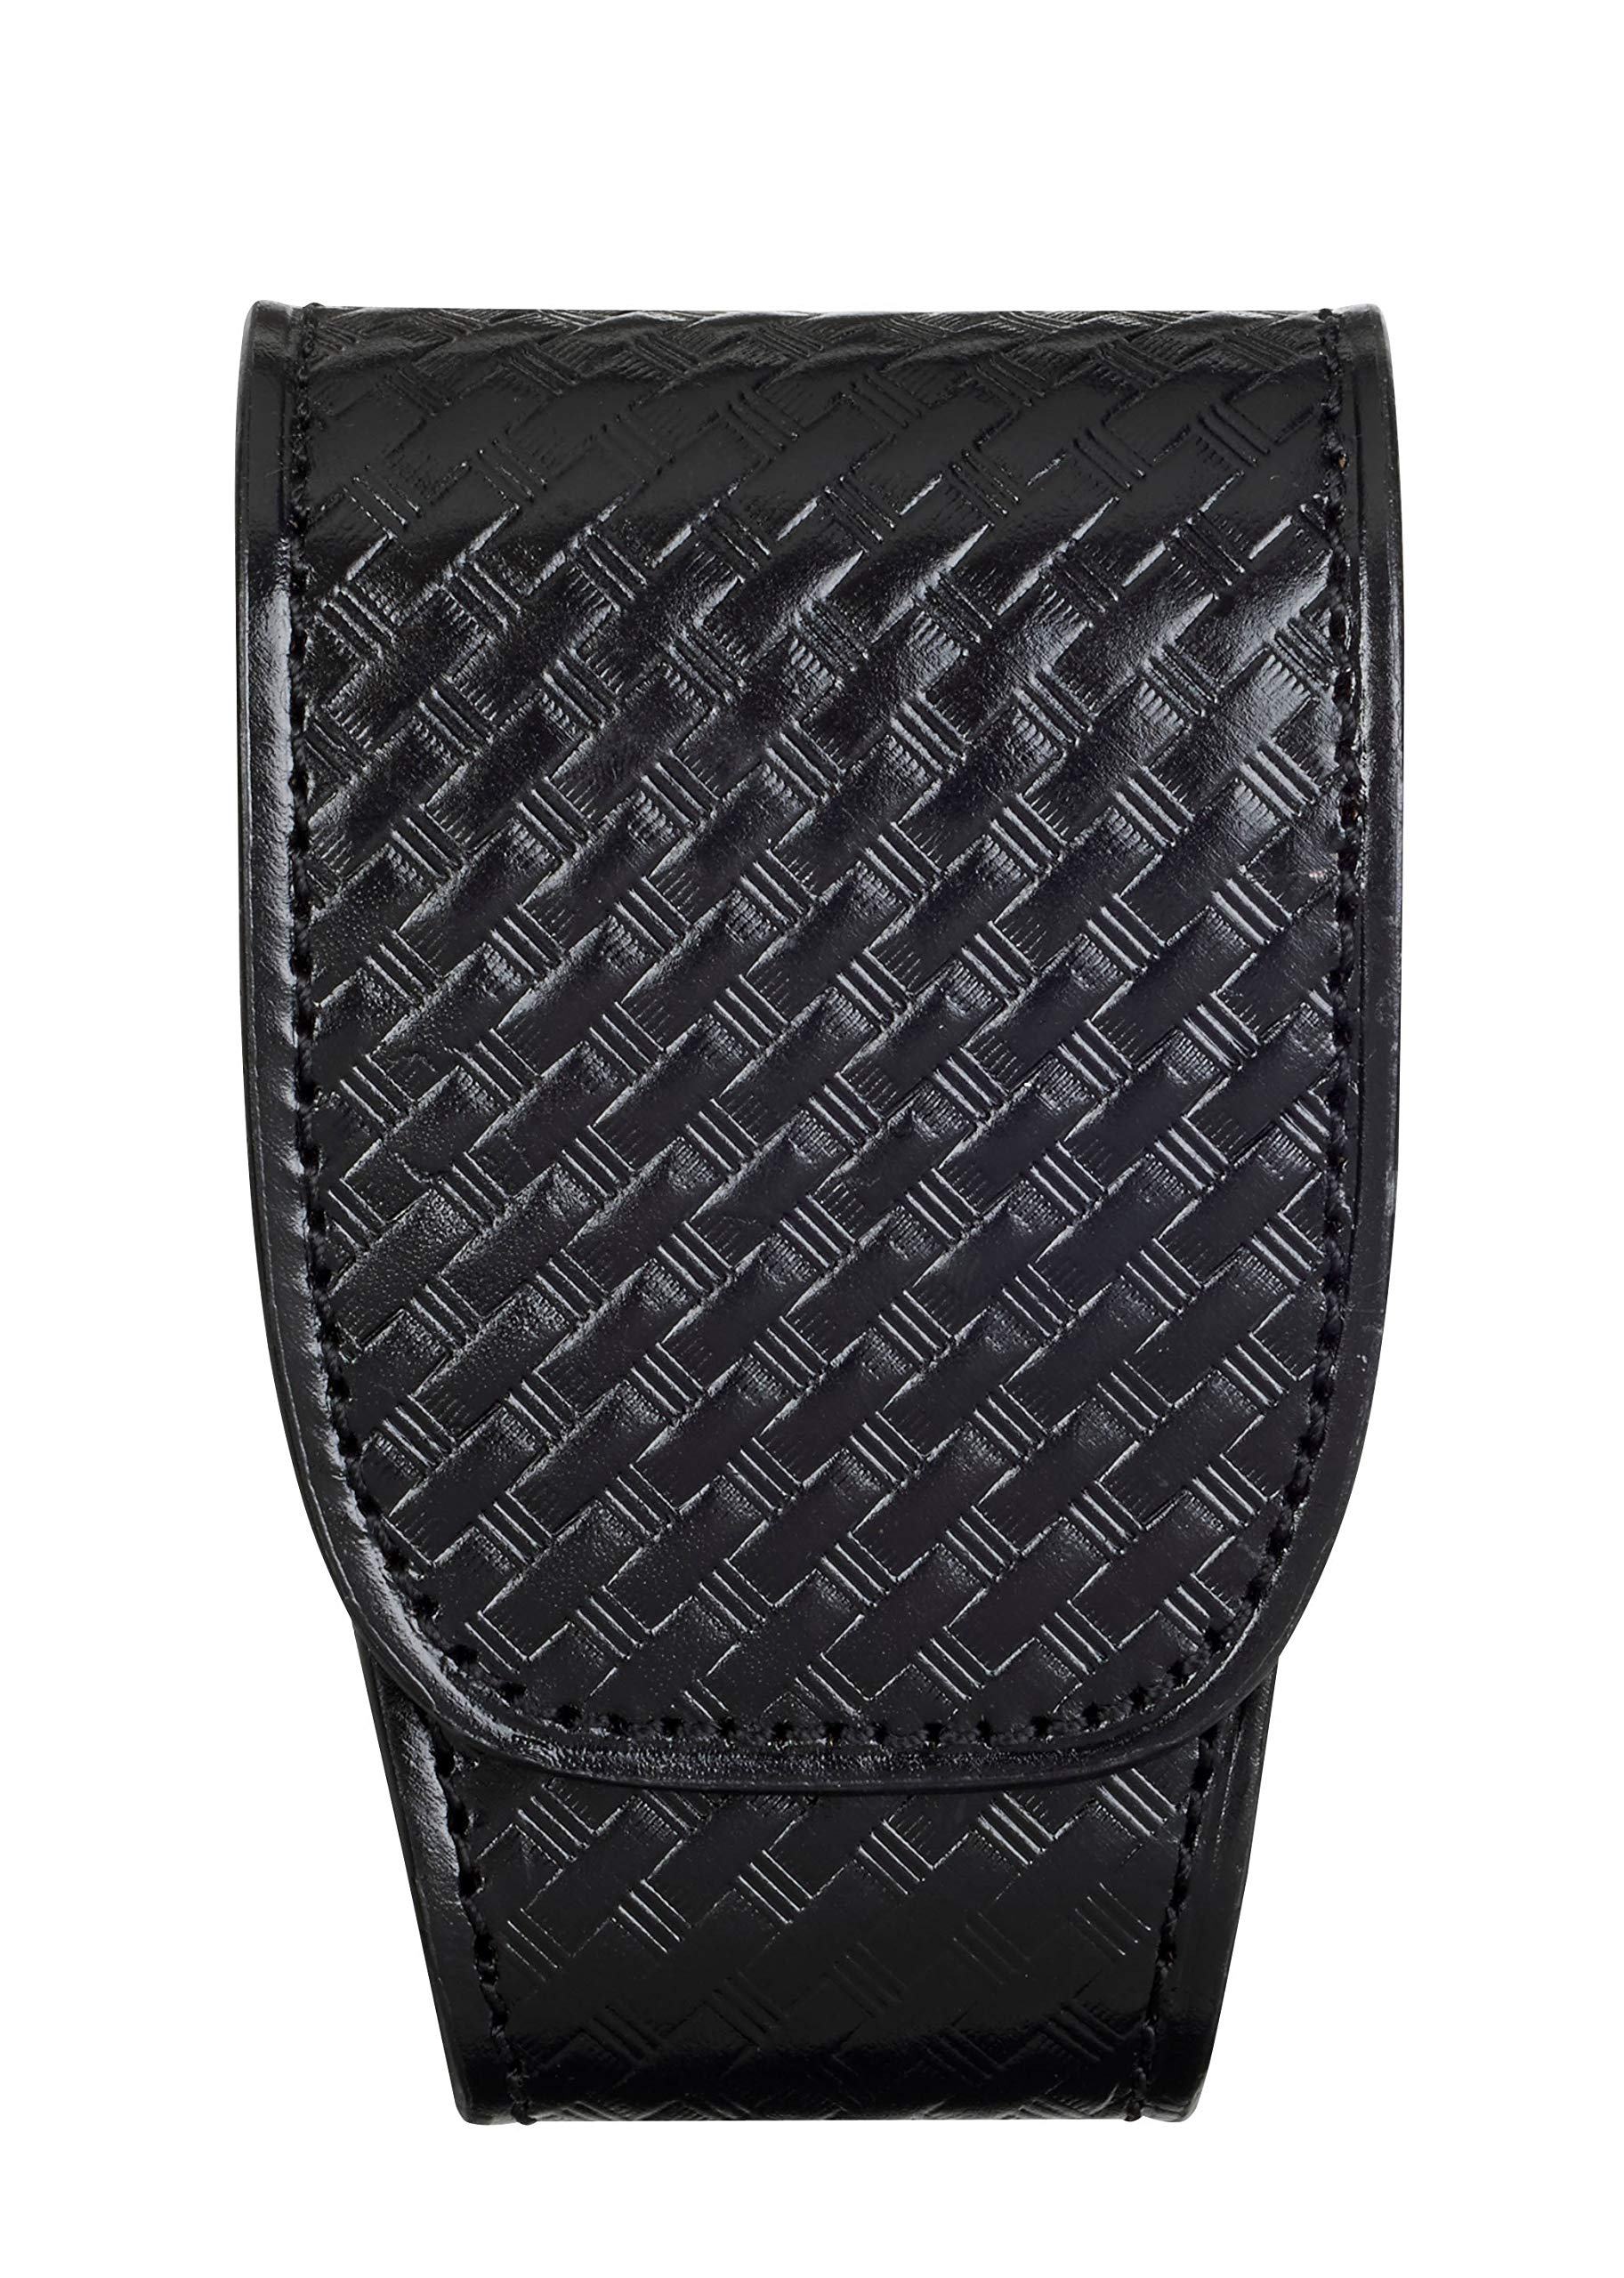 ASP Duty Handcuff Case, Chain/Hinge, Snap-Loc Clip, Basketweave by ASP